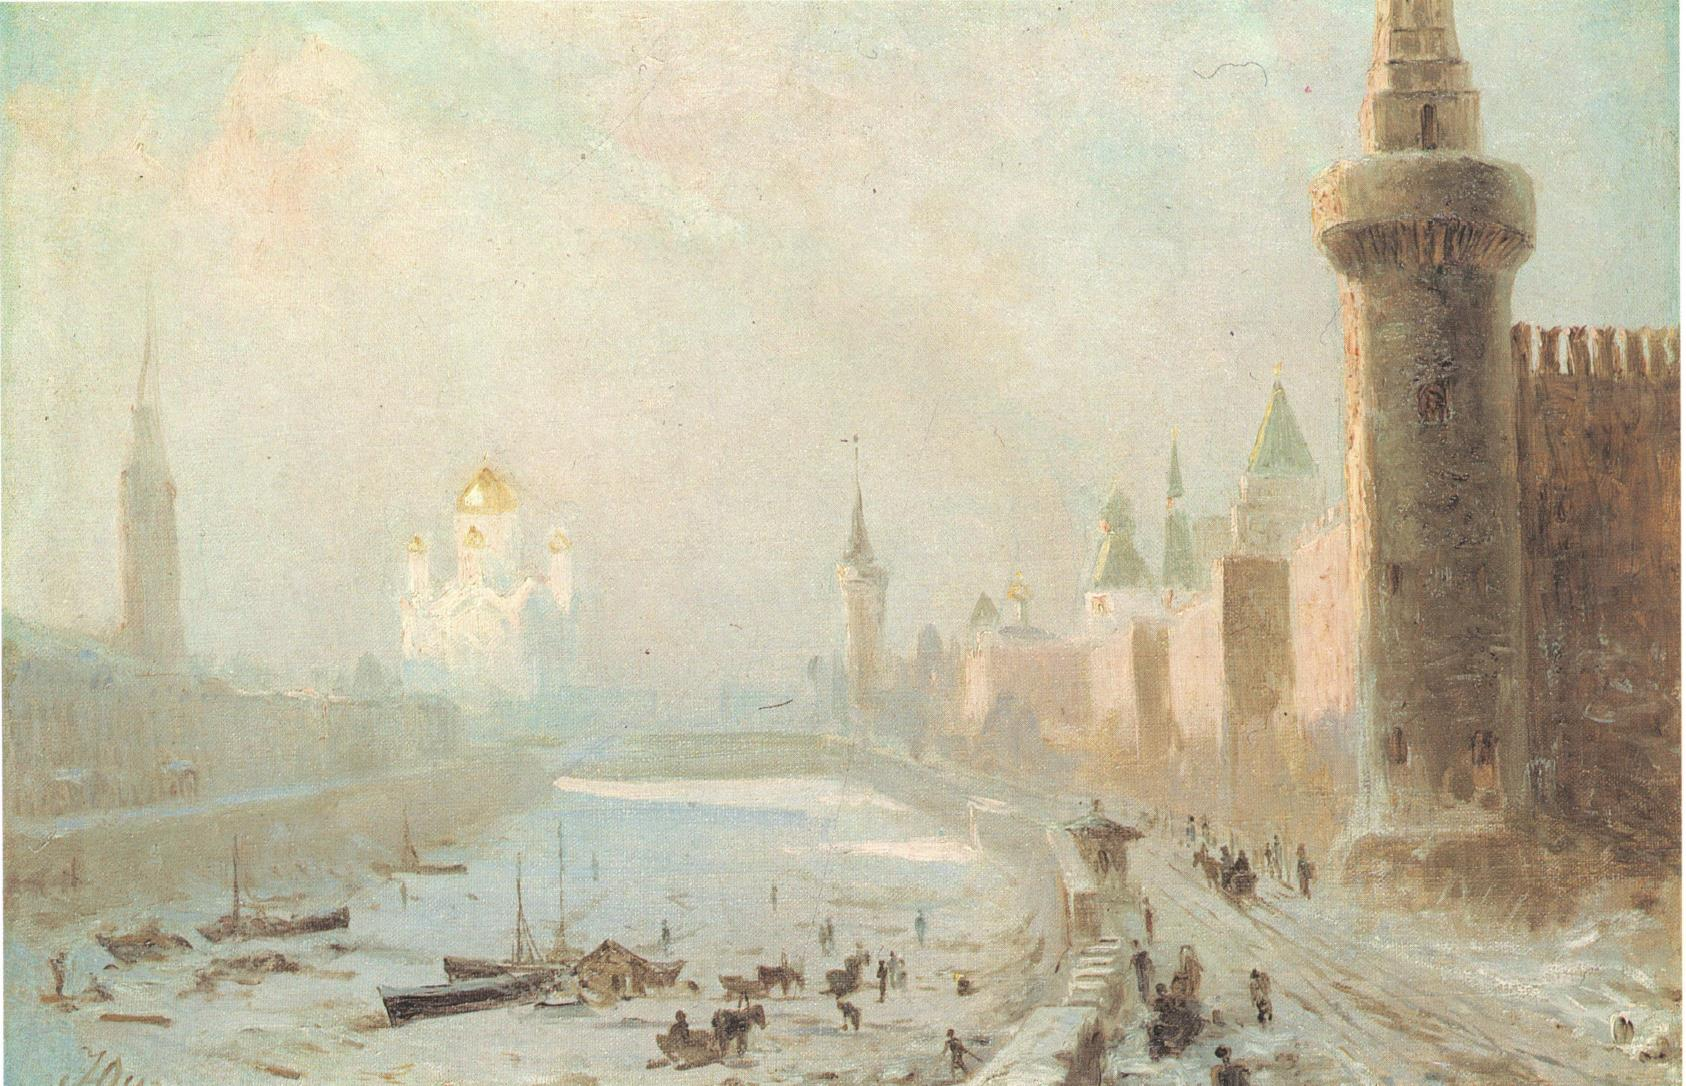 1860-е. Вид Кремля и Храма Христа Спасителя зимой